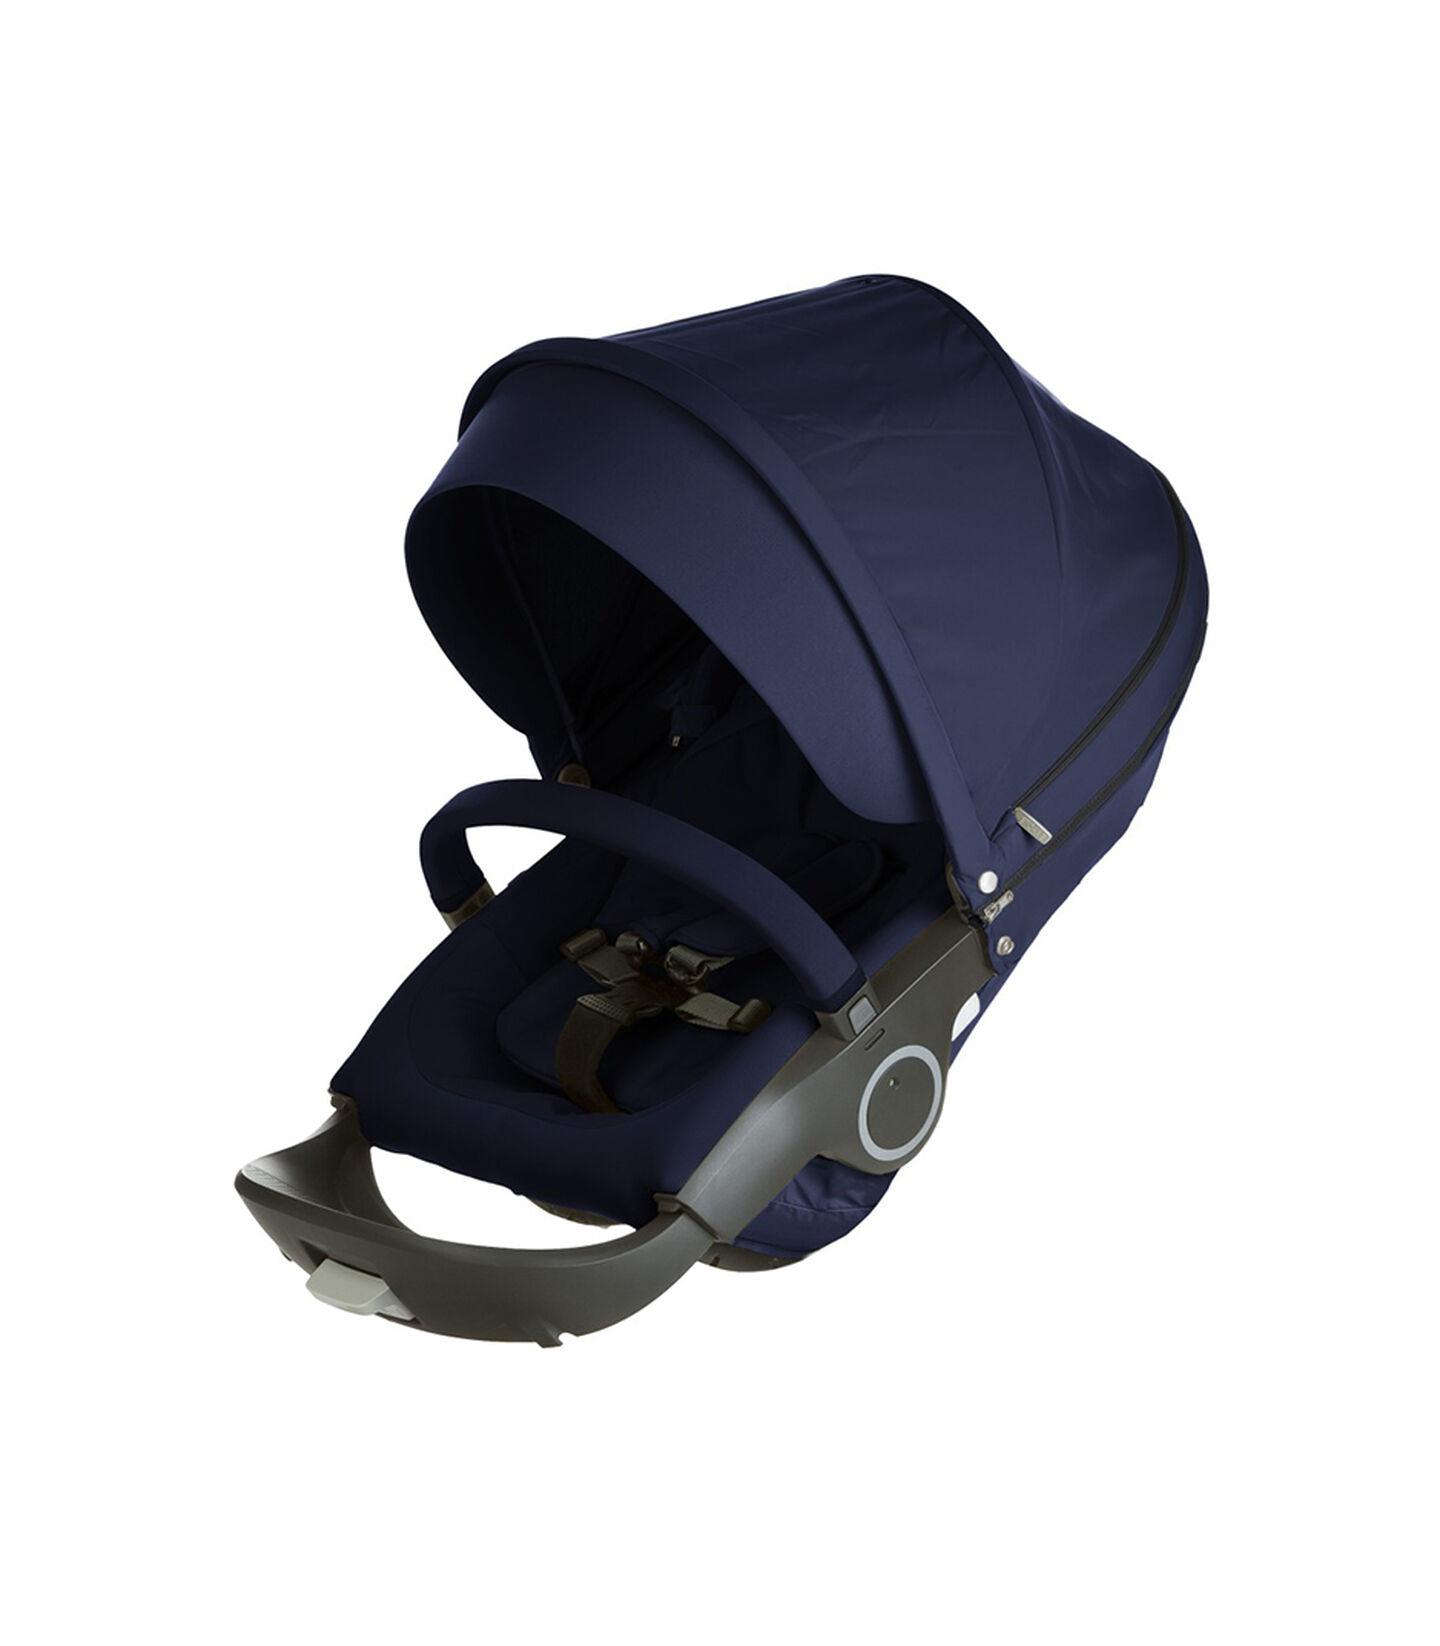 Accessories. Stokke Xplory & Crusi Seat. Deep Blue.